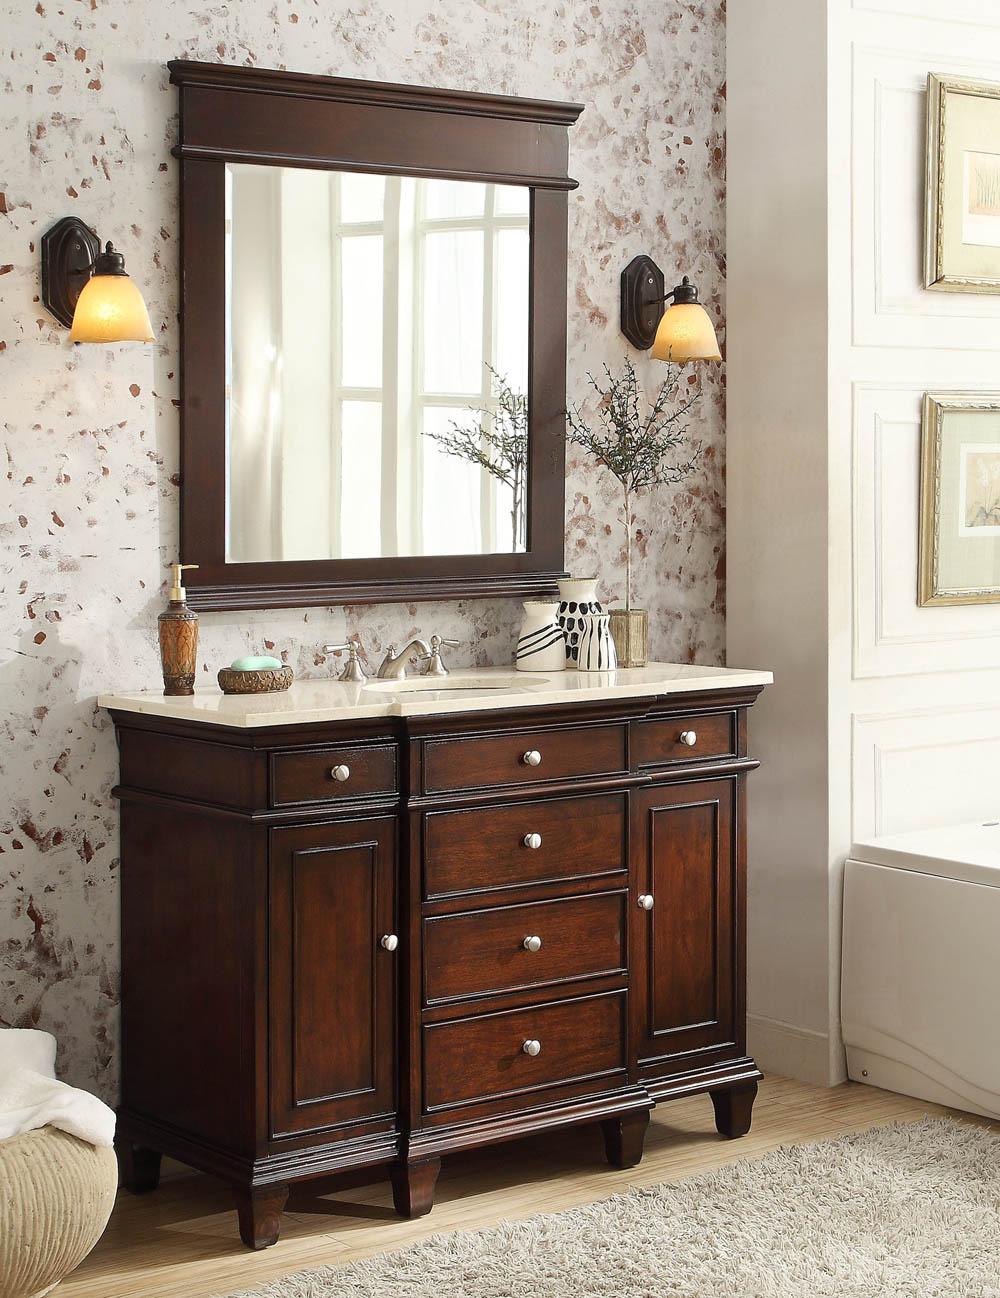 48 inch Adelina Bathroom Vanity Sink Cream Marble Top